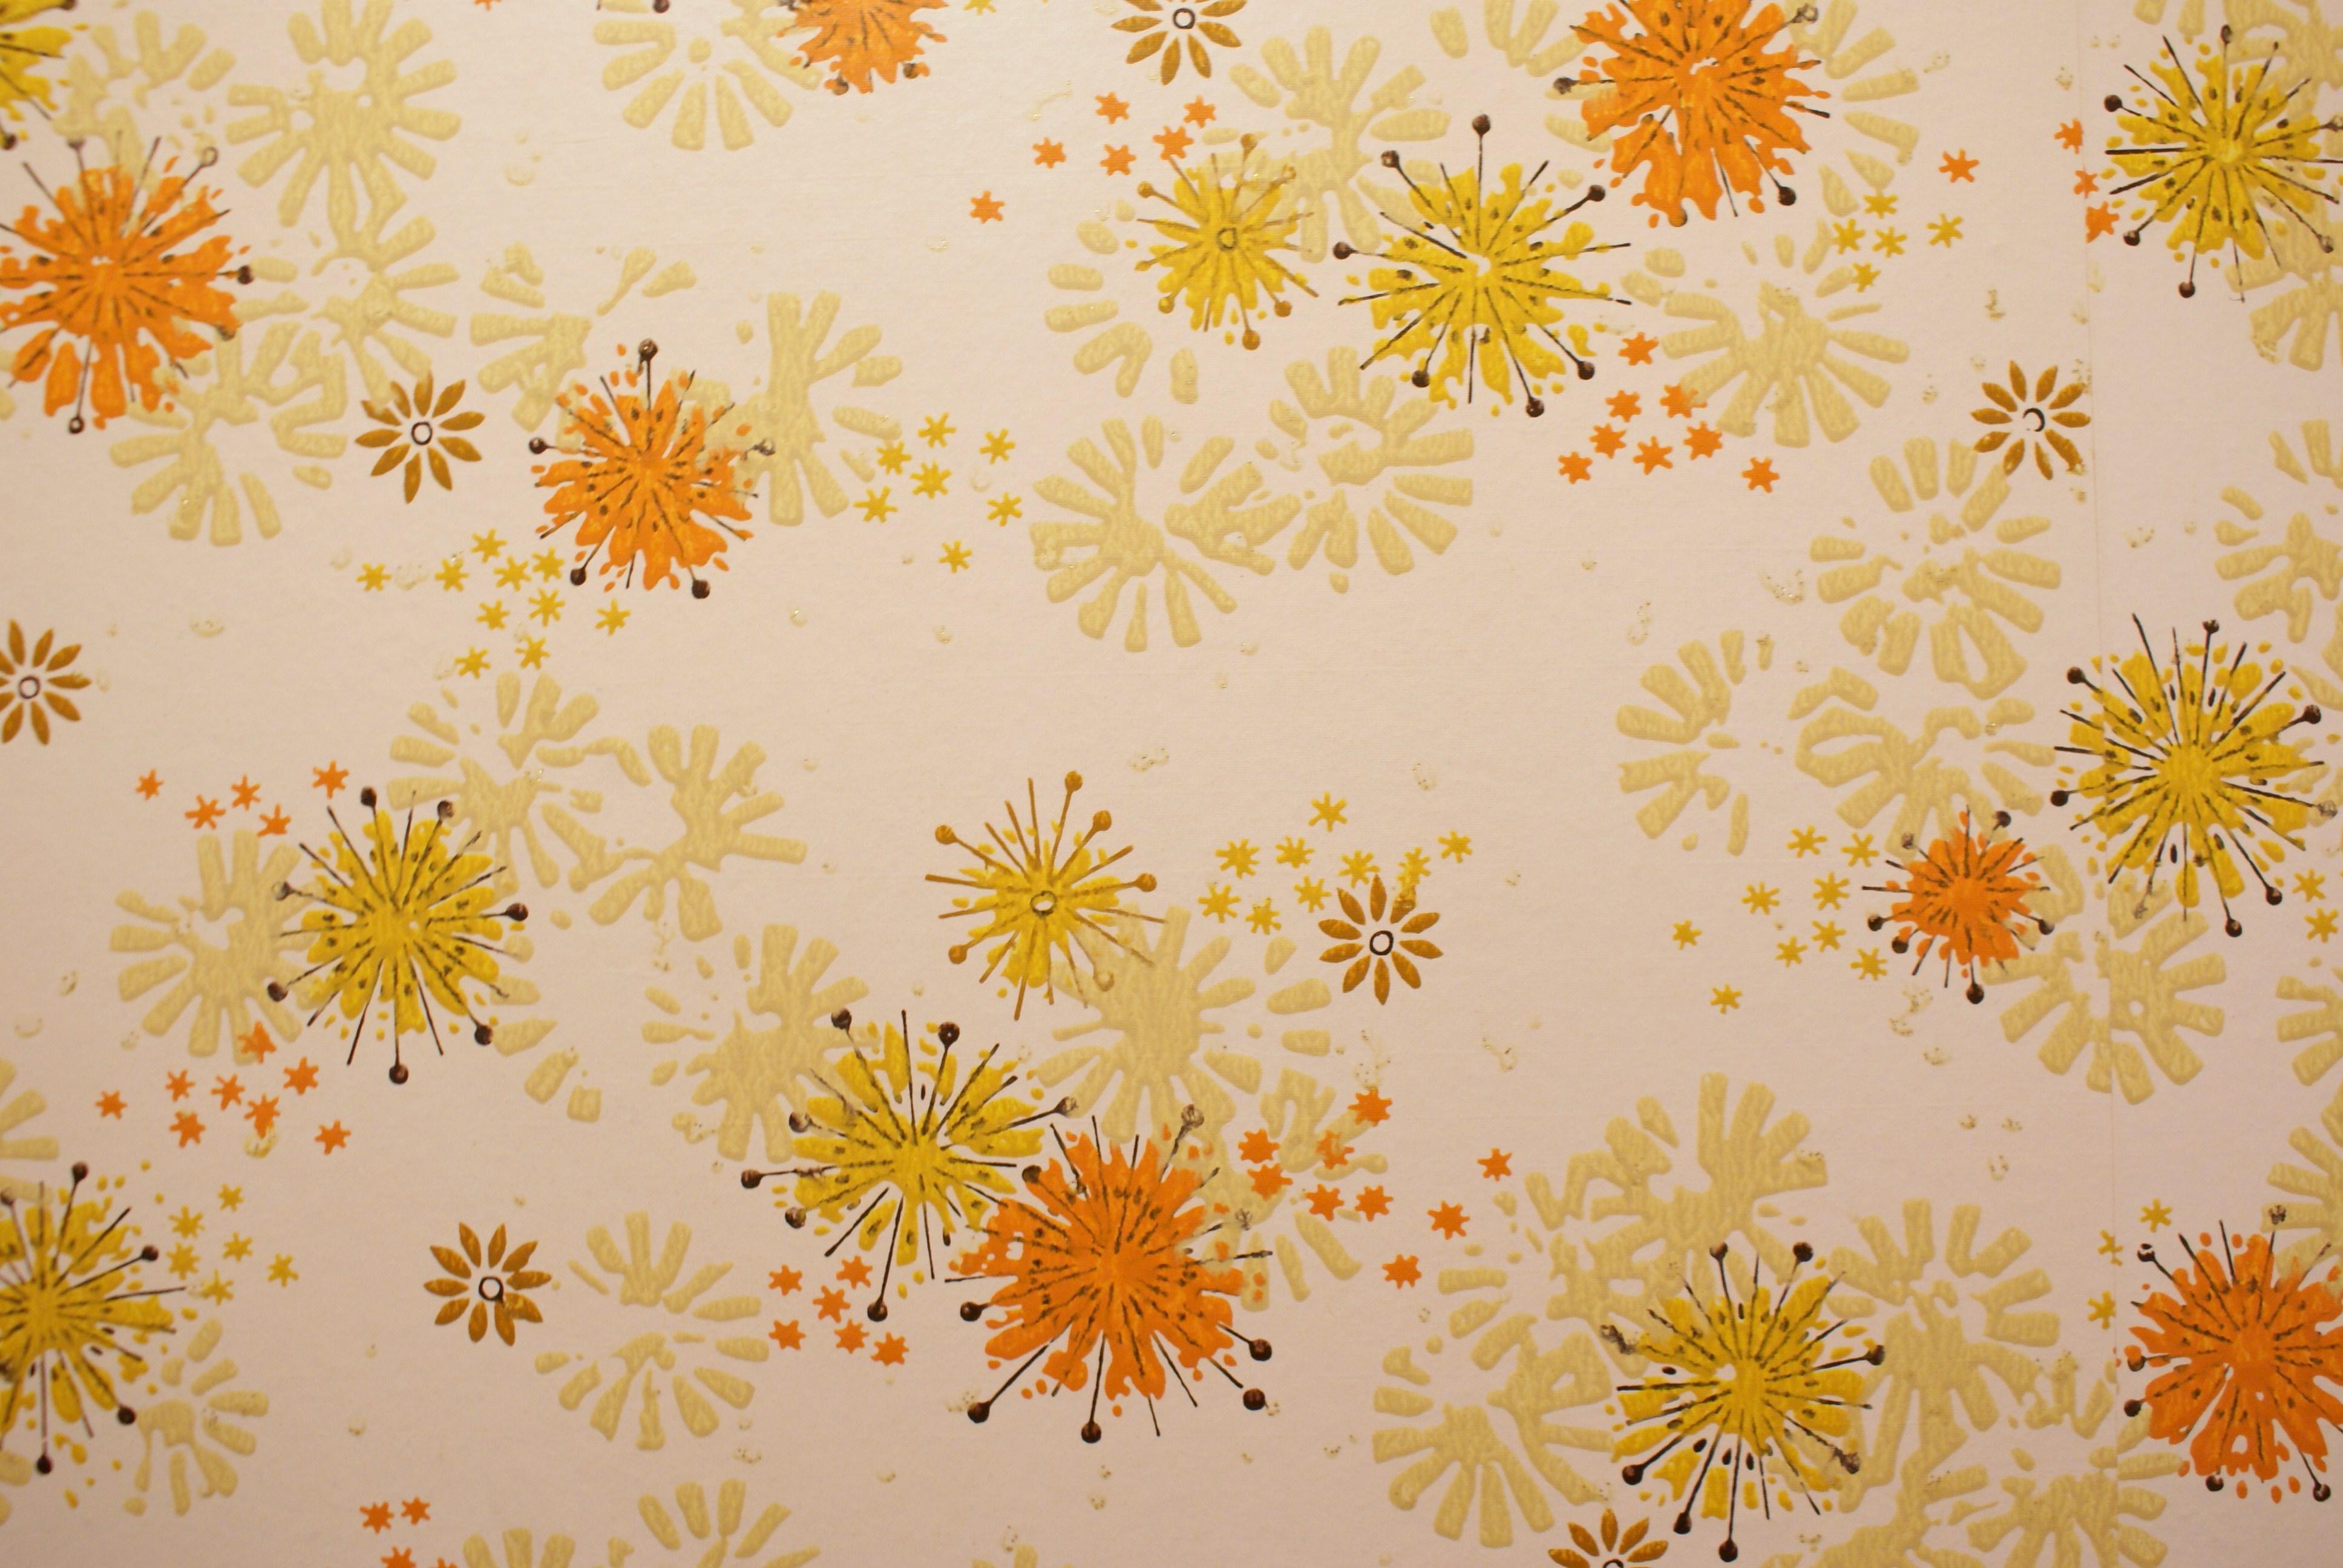 Vintage Wallpaper vintage orange wallpaper retro 70s 1970s yellow 3872x2592